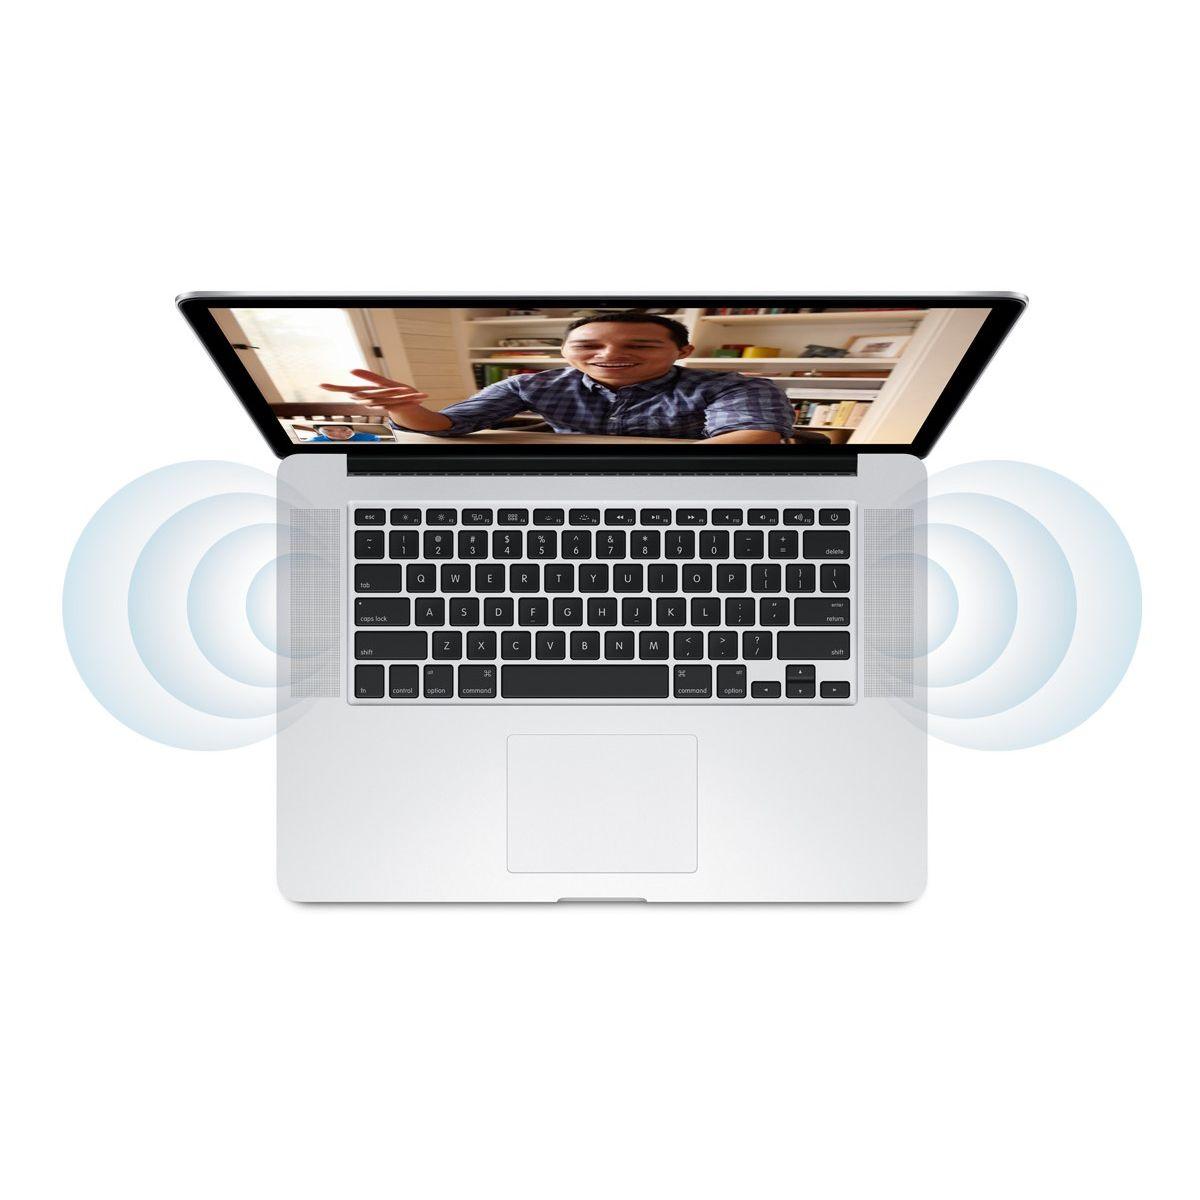 APPLE Macbook Pro Retina 13.3 2.7GHz 8Go 128Go